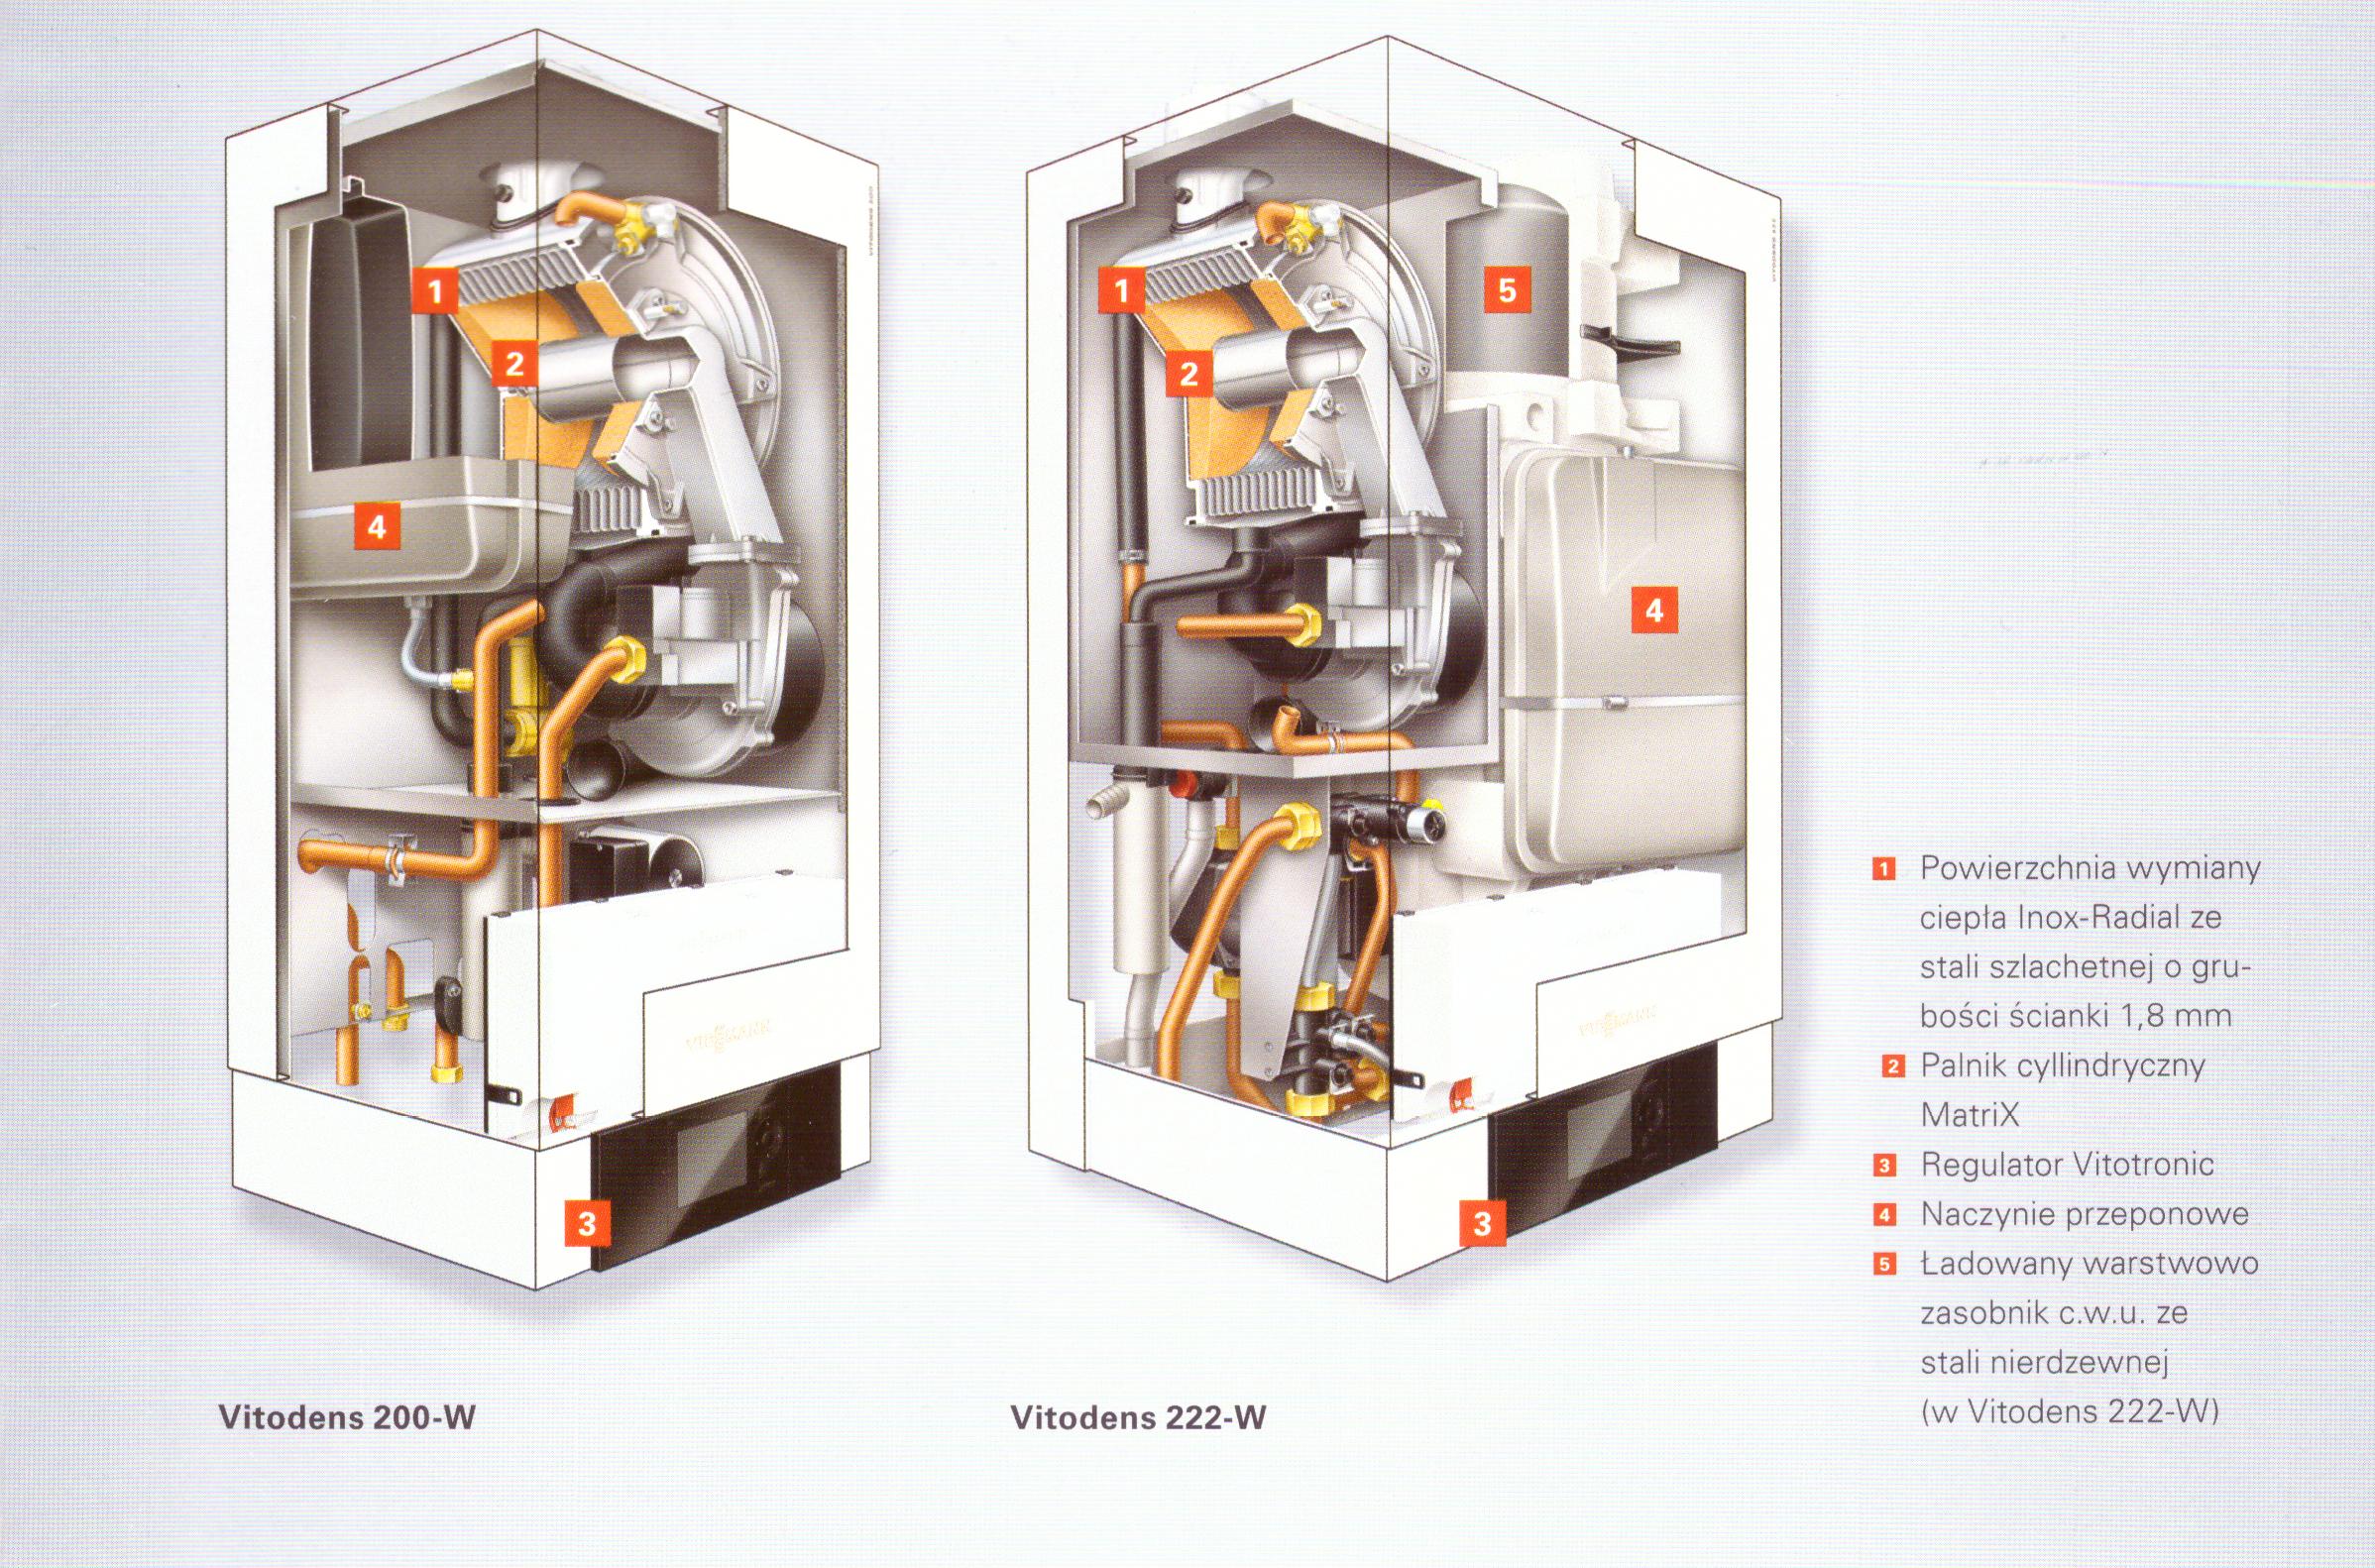 Vitodens-200